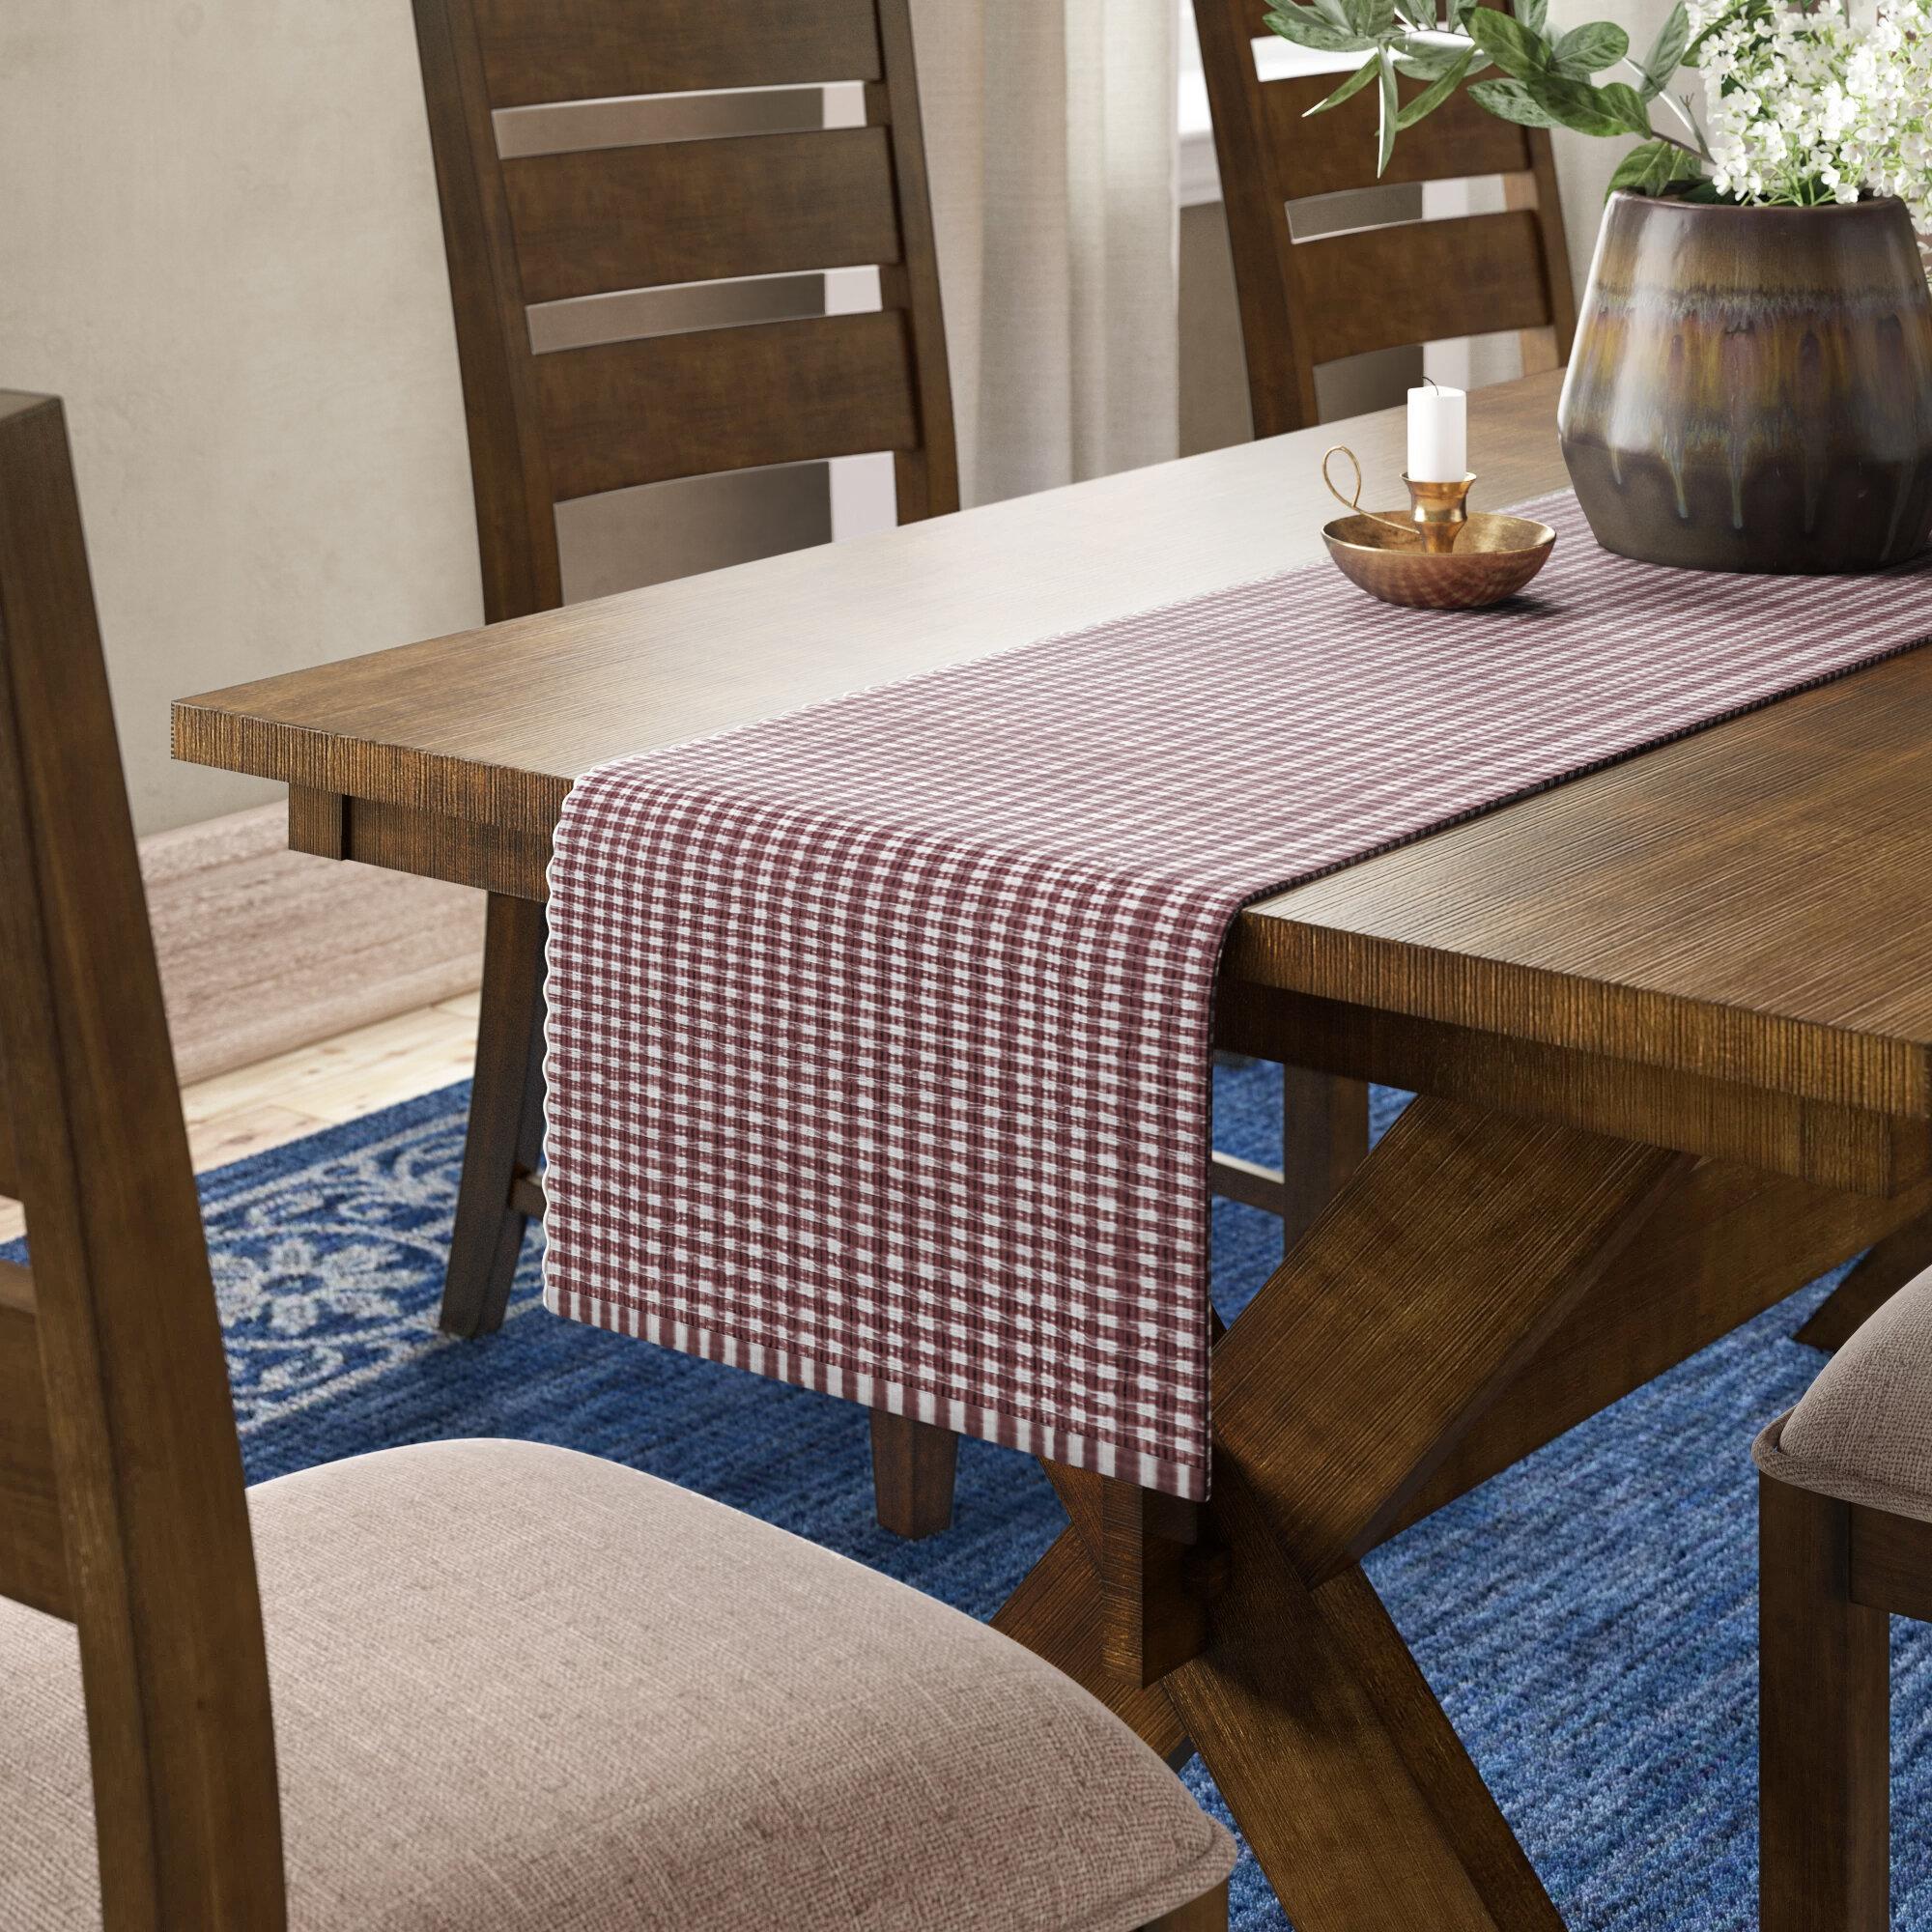 Ceylon Gingham 100 Cotton Table Runner Reviews Birch Lane